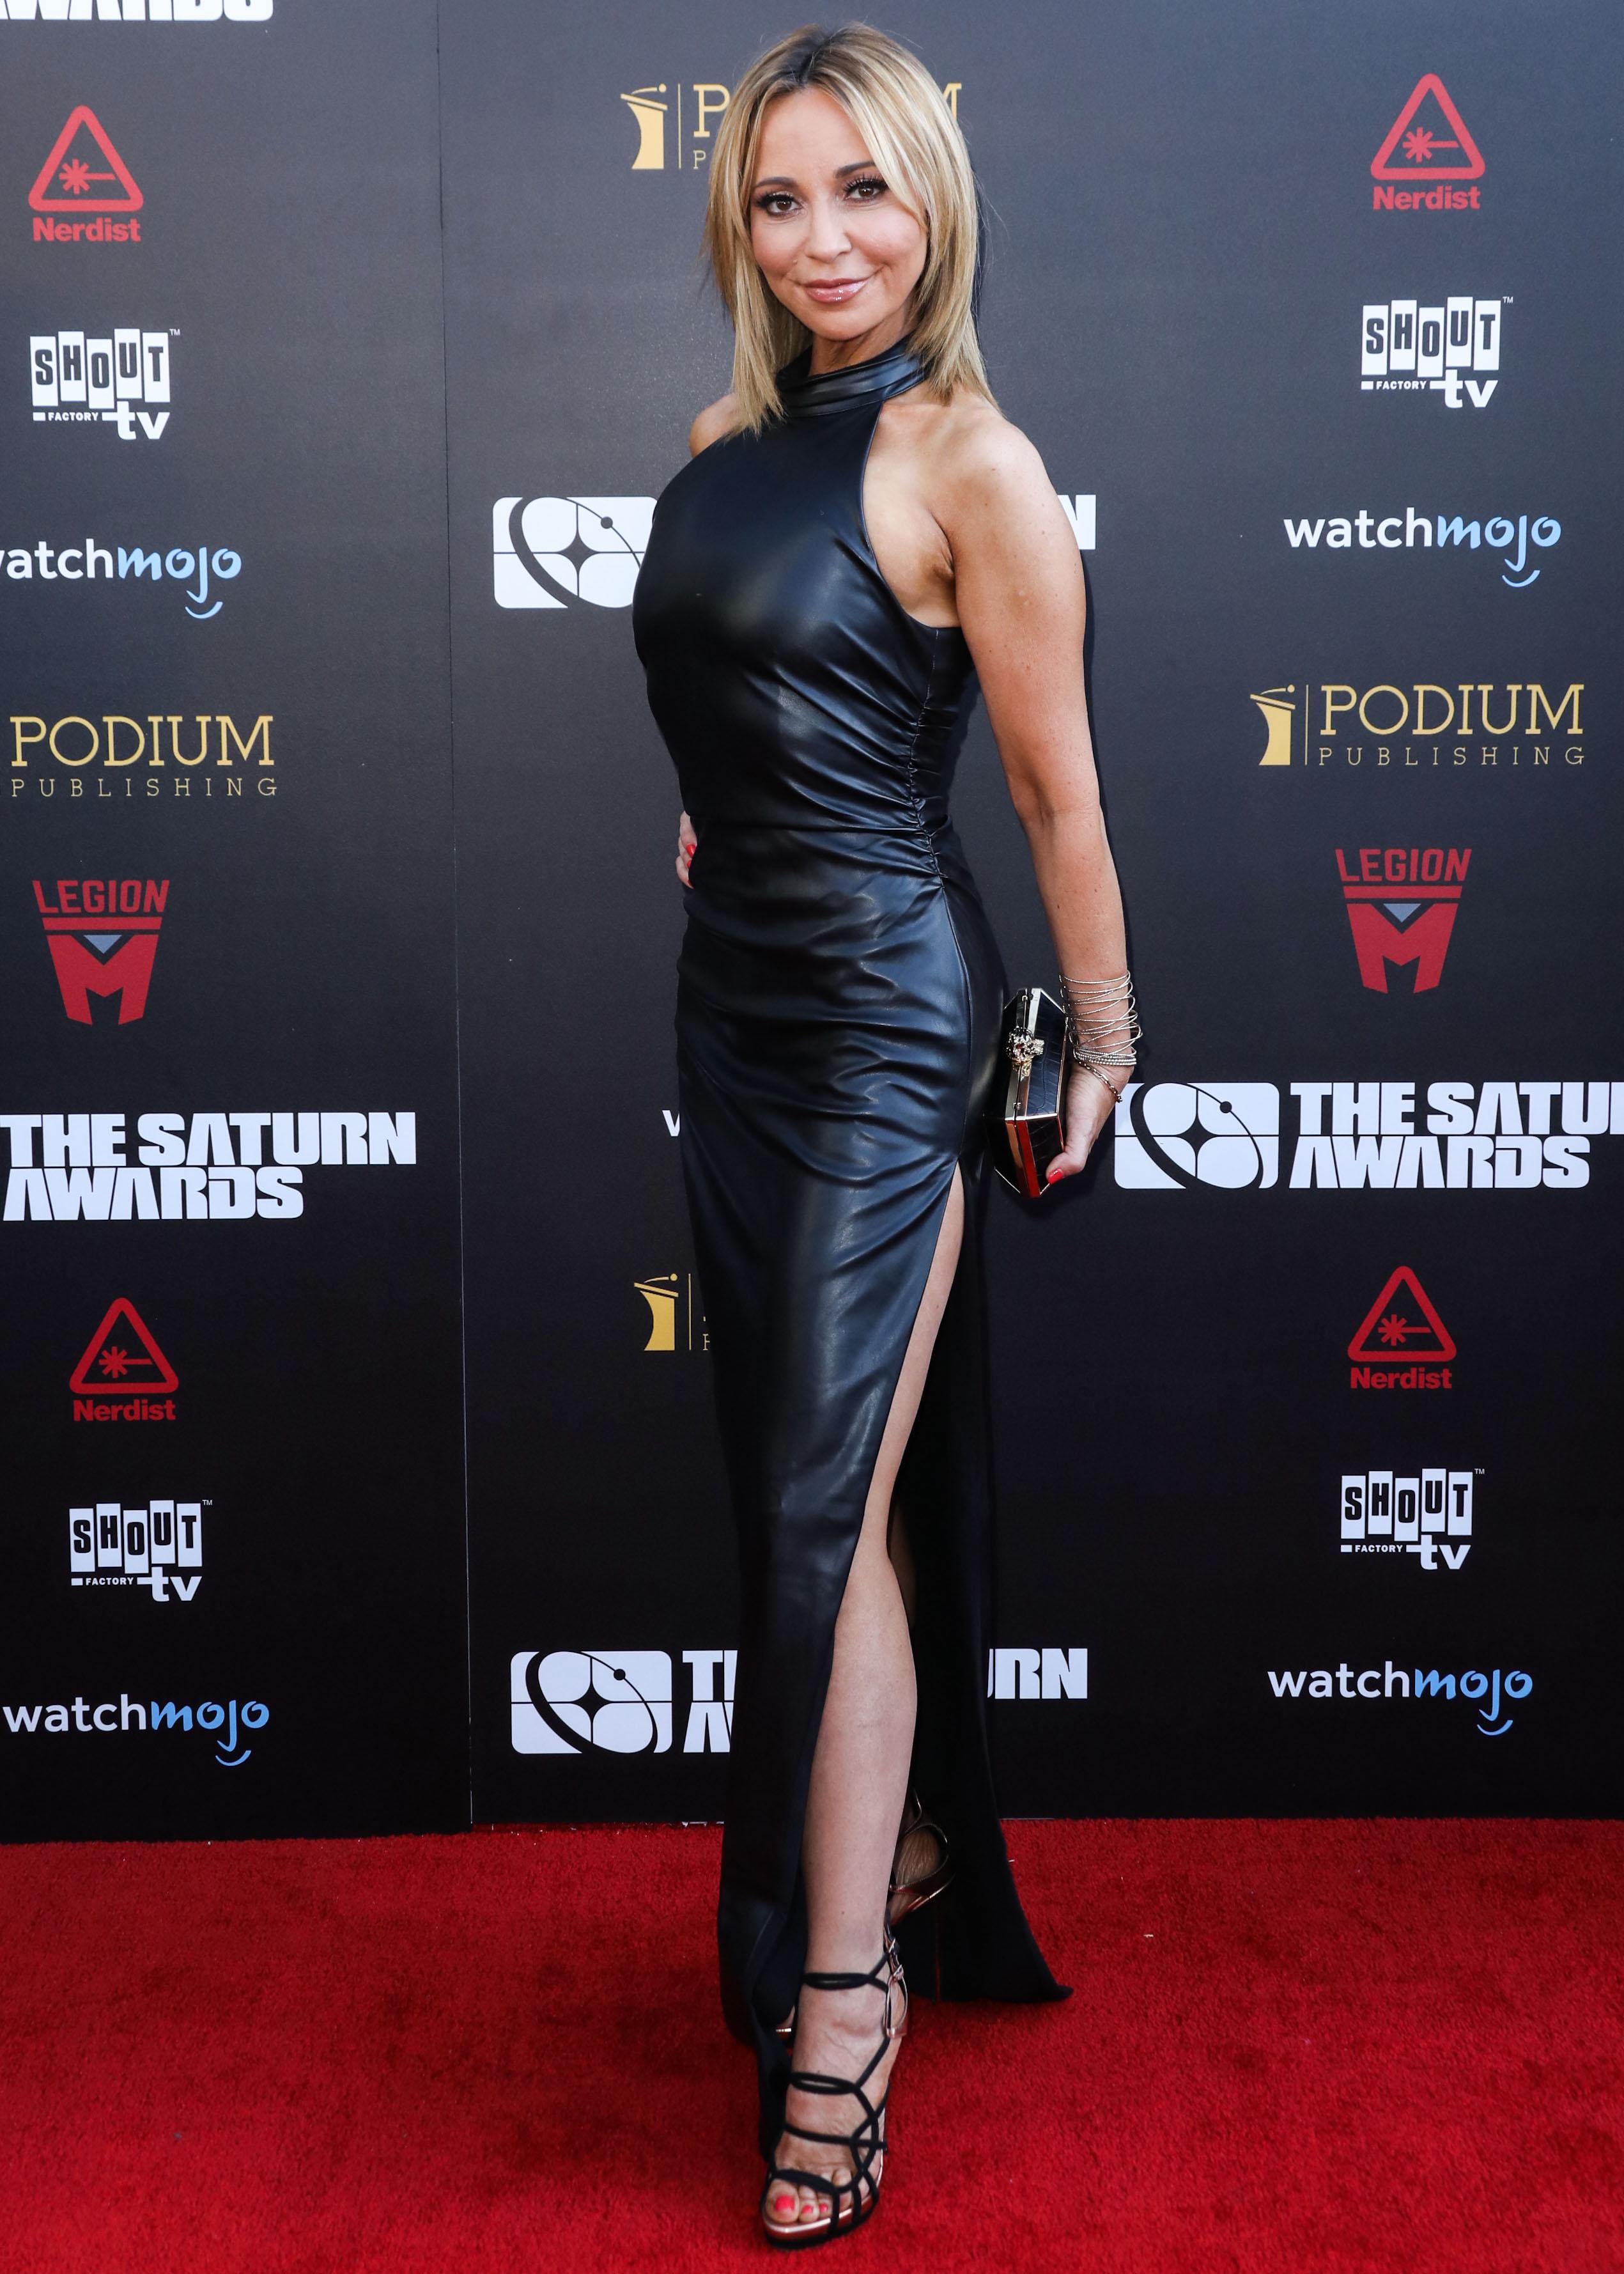 Tara Strong attends 45th Annual Saturn Awards